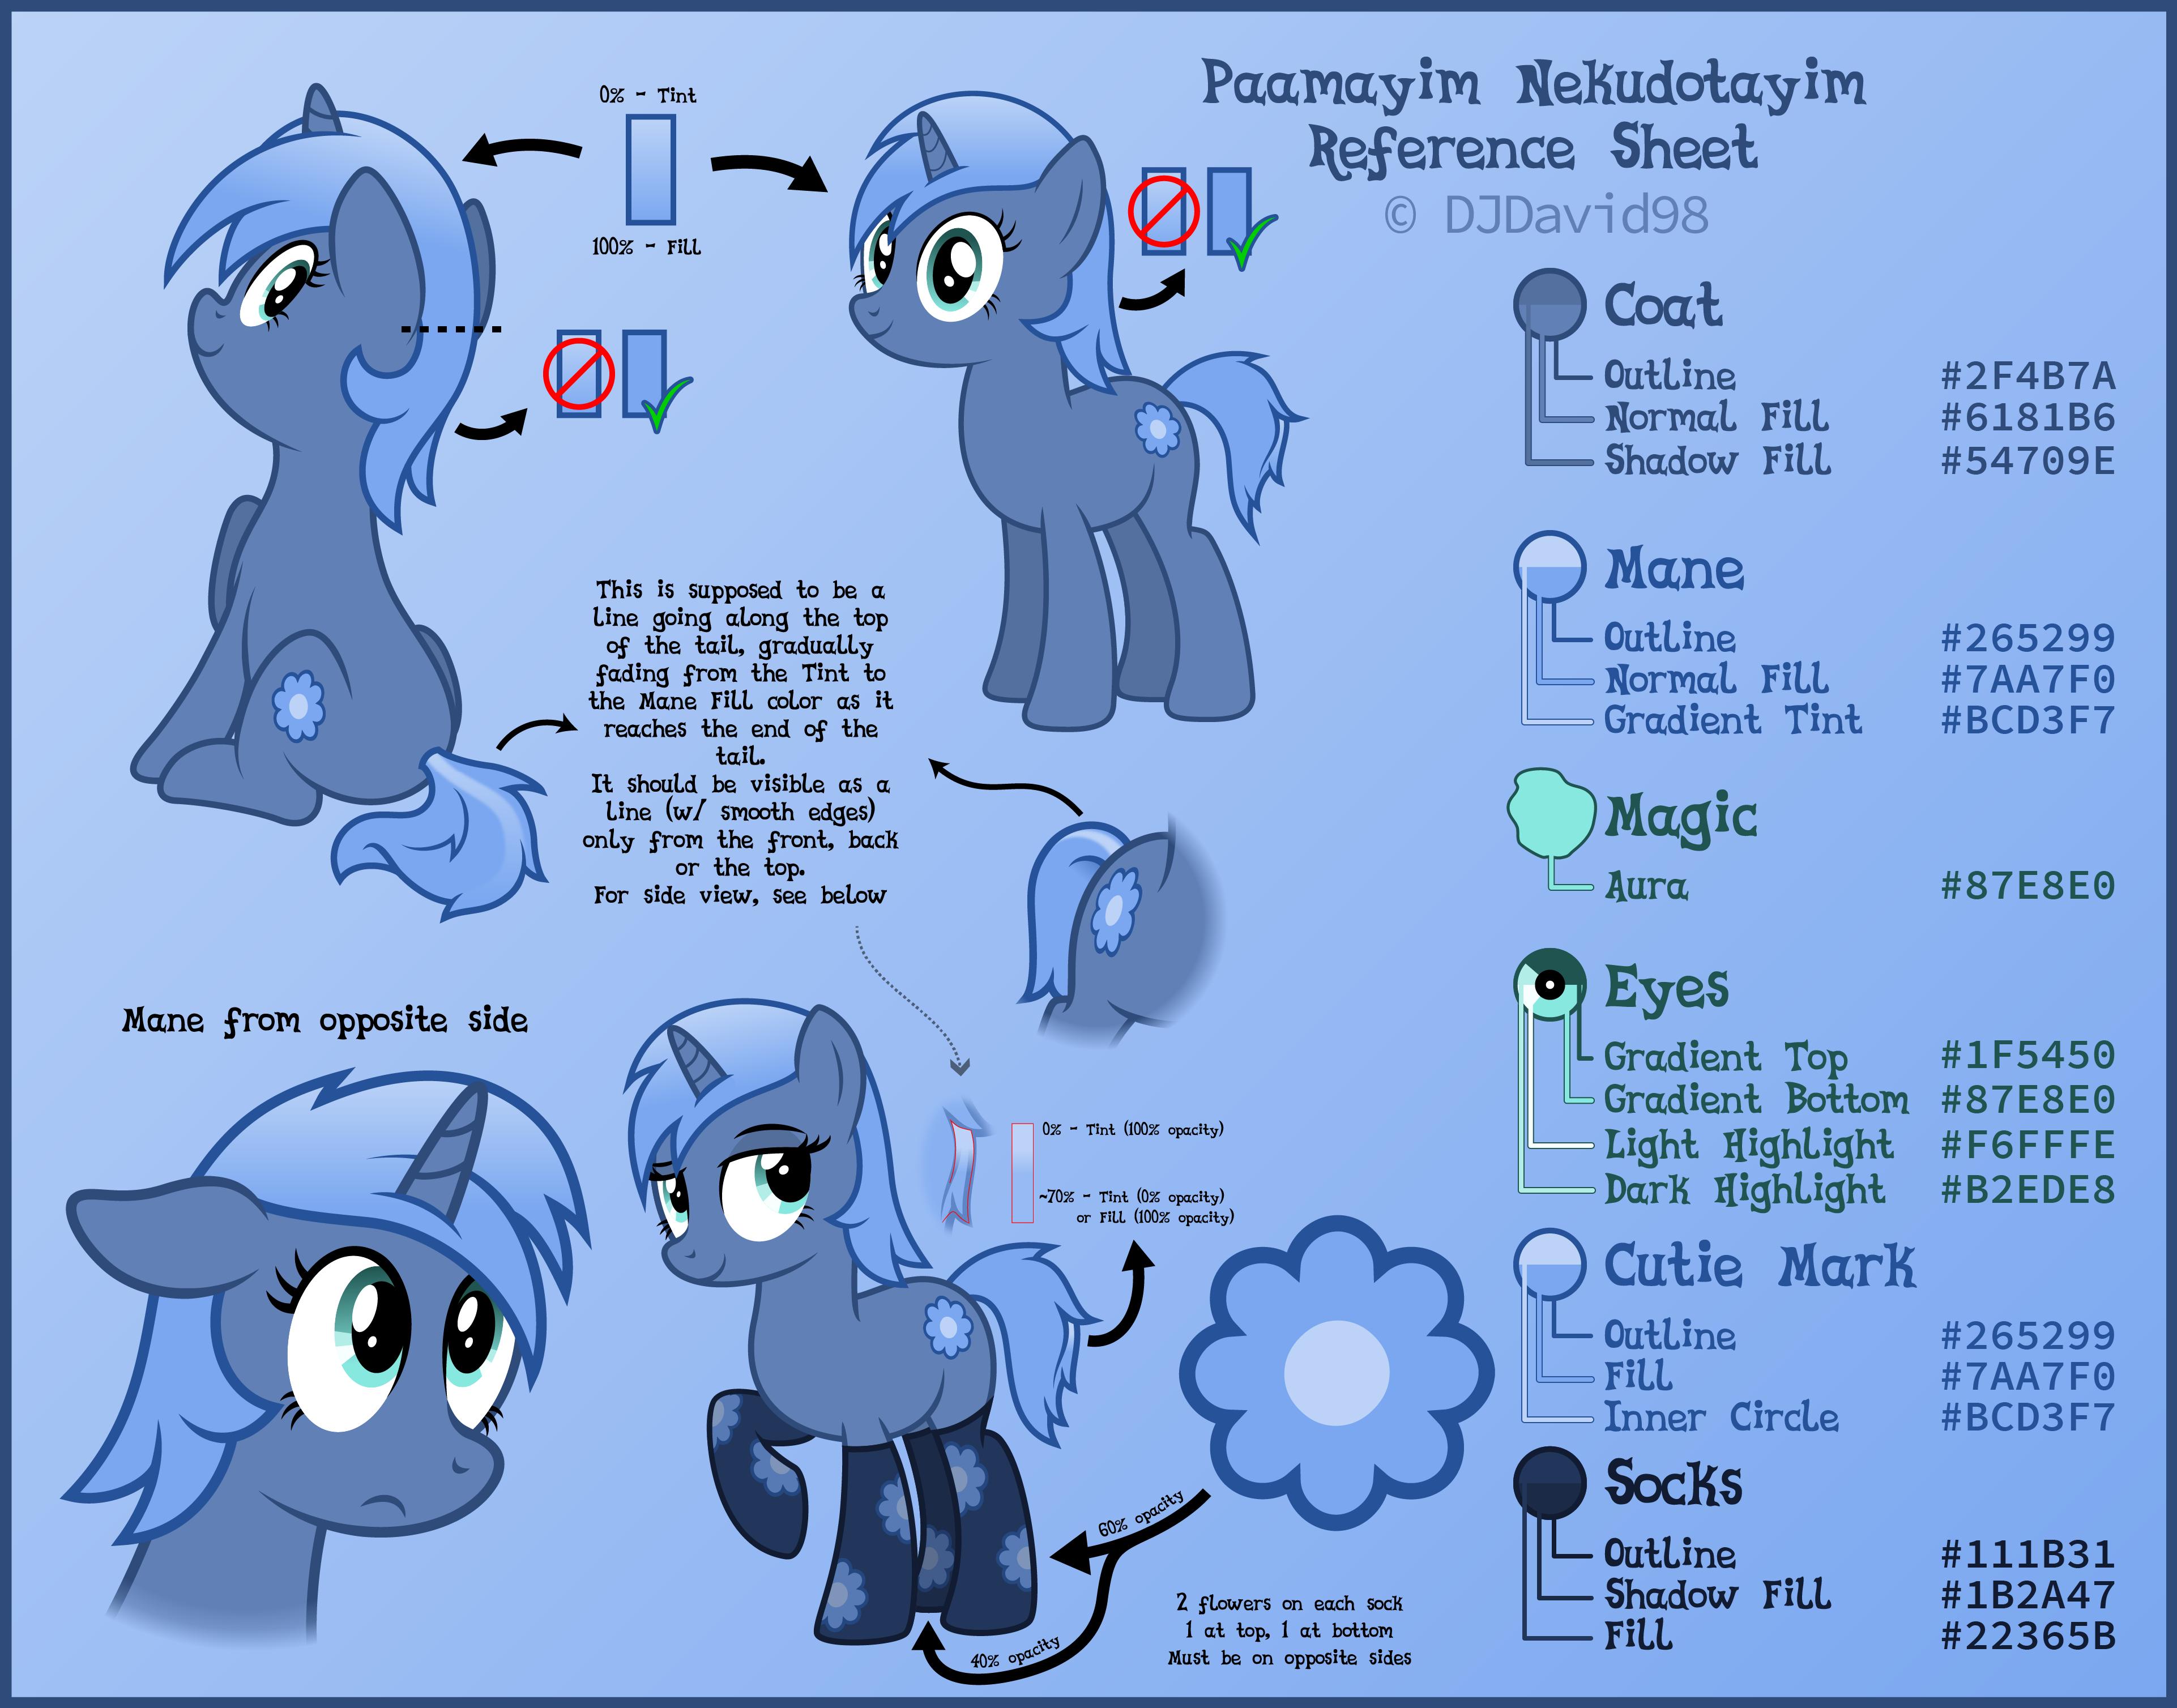 Paamayim Nekudotayim / PHP Pony - reference sheet by DJDavid98